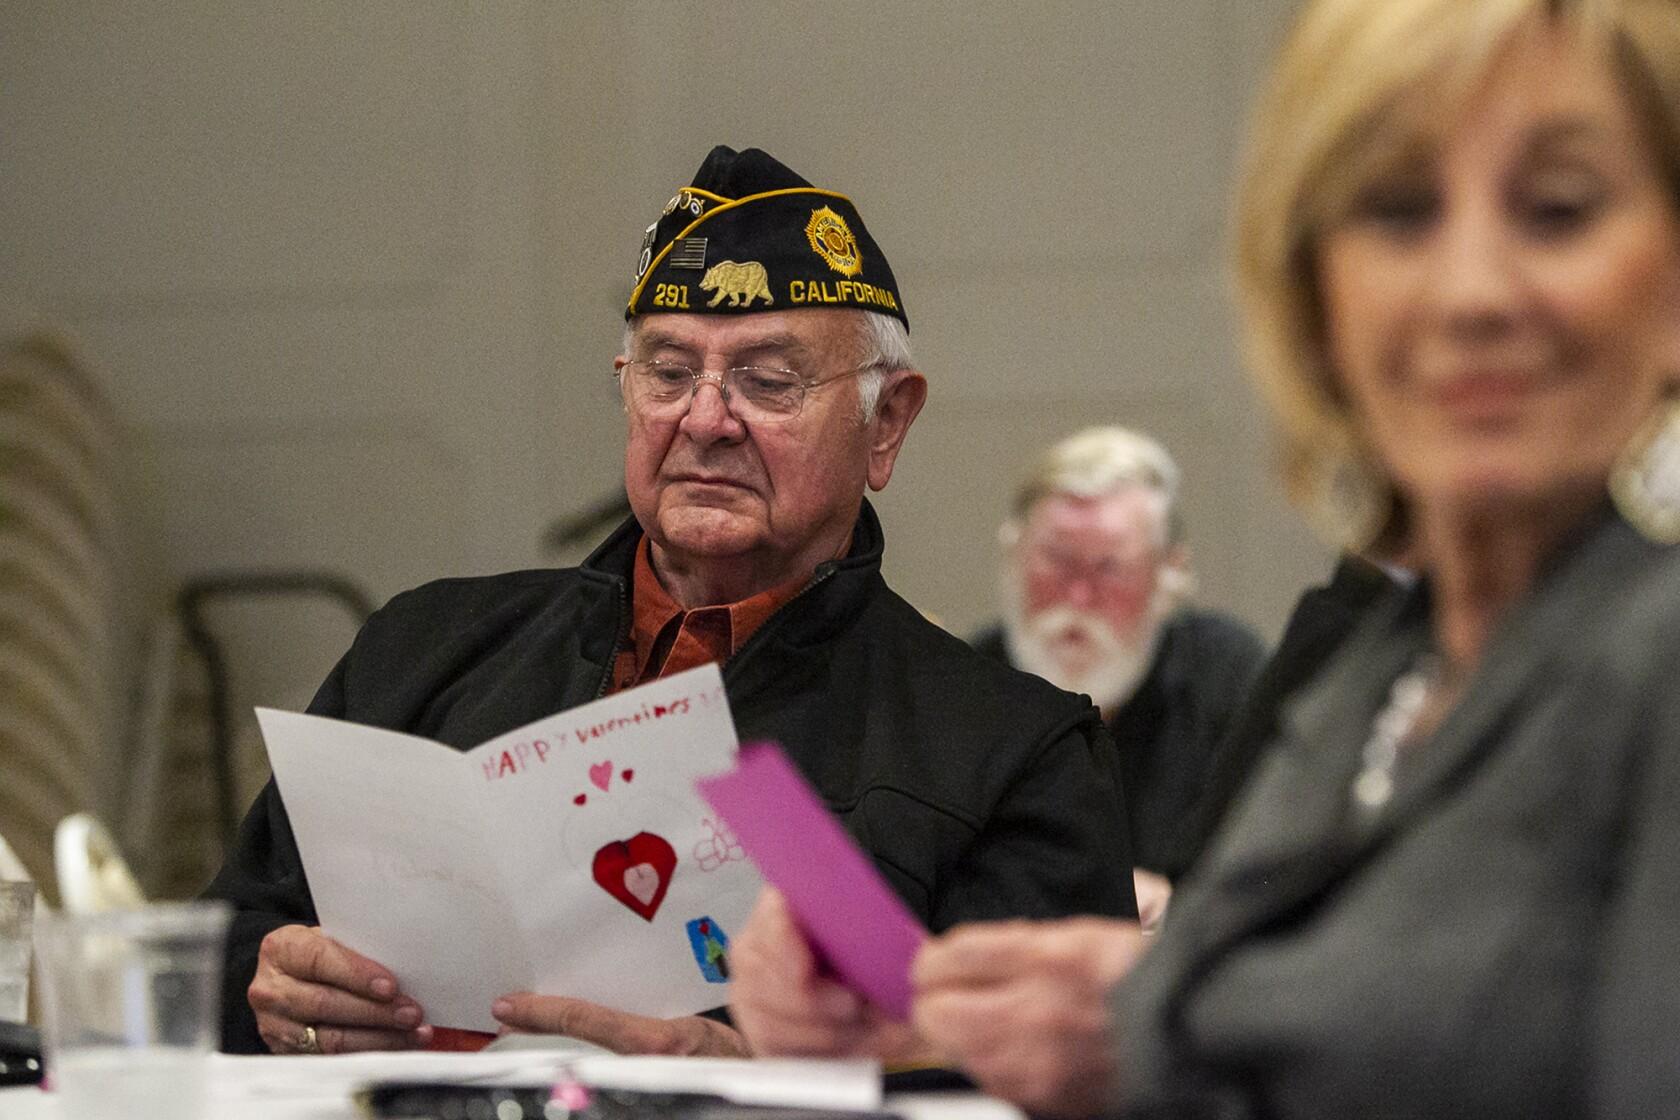 Vets get Valentine's love from community at Newport American Legion post